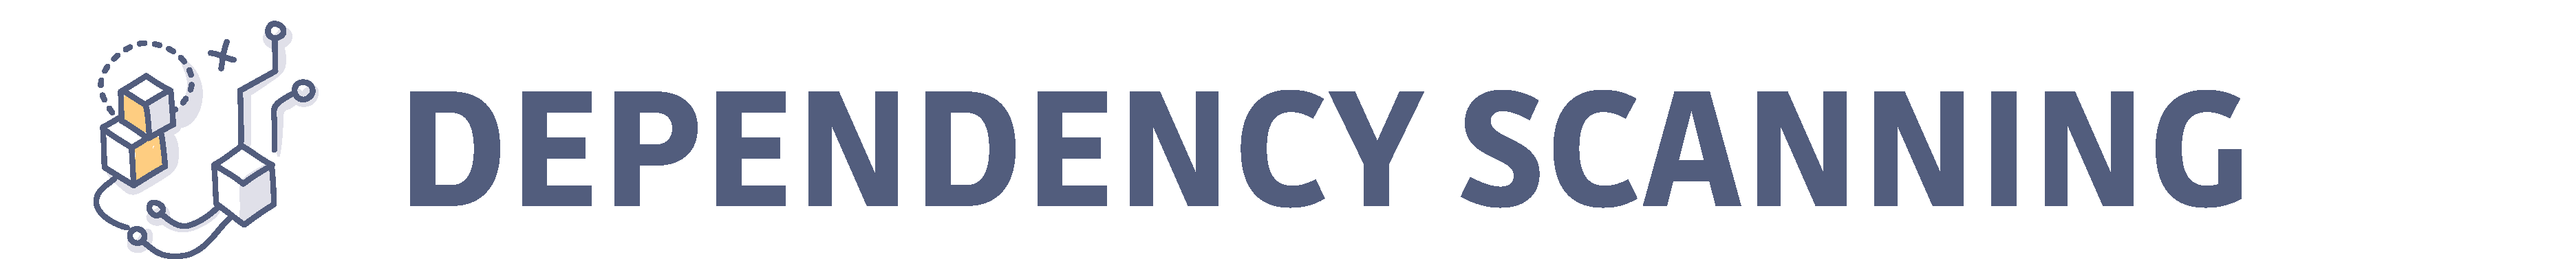 dependency scanning